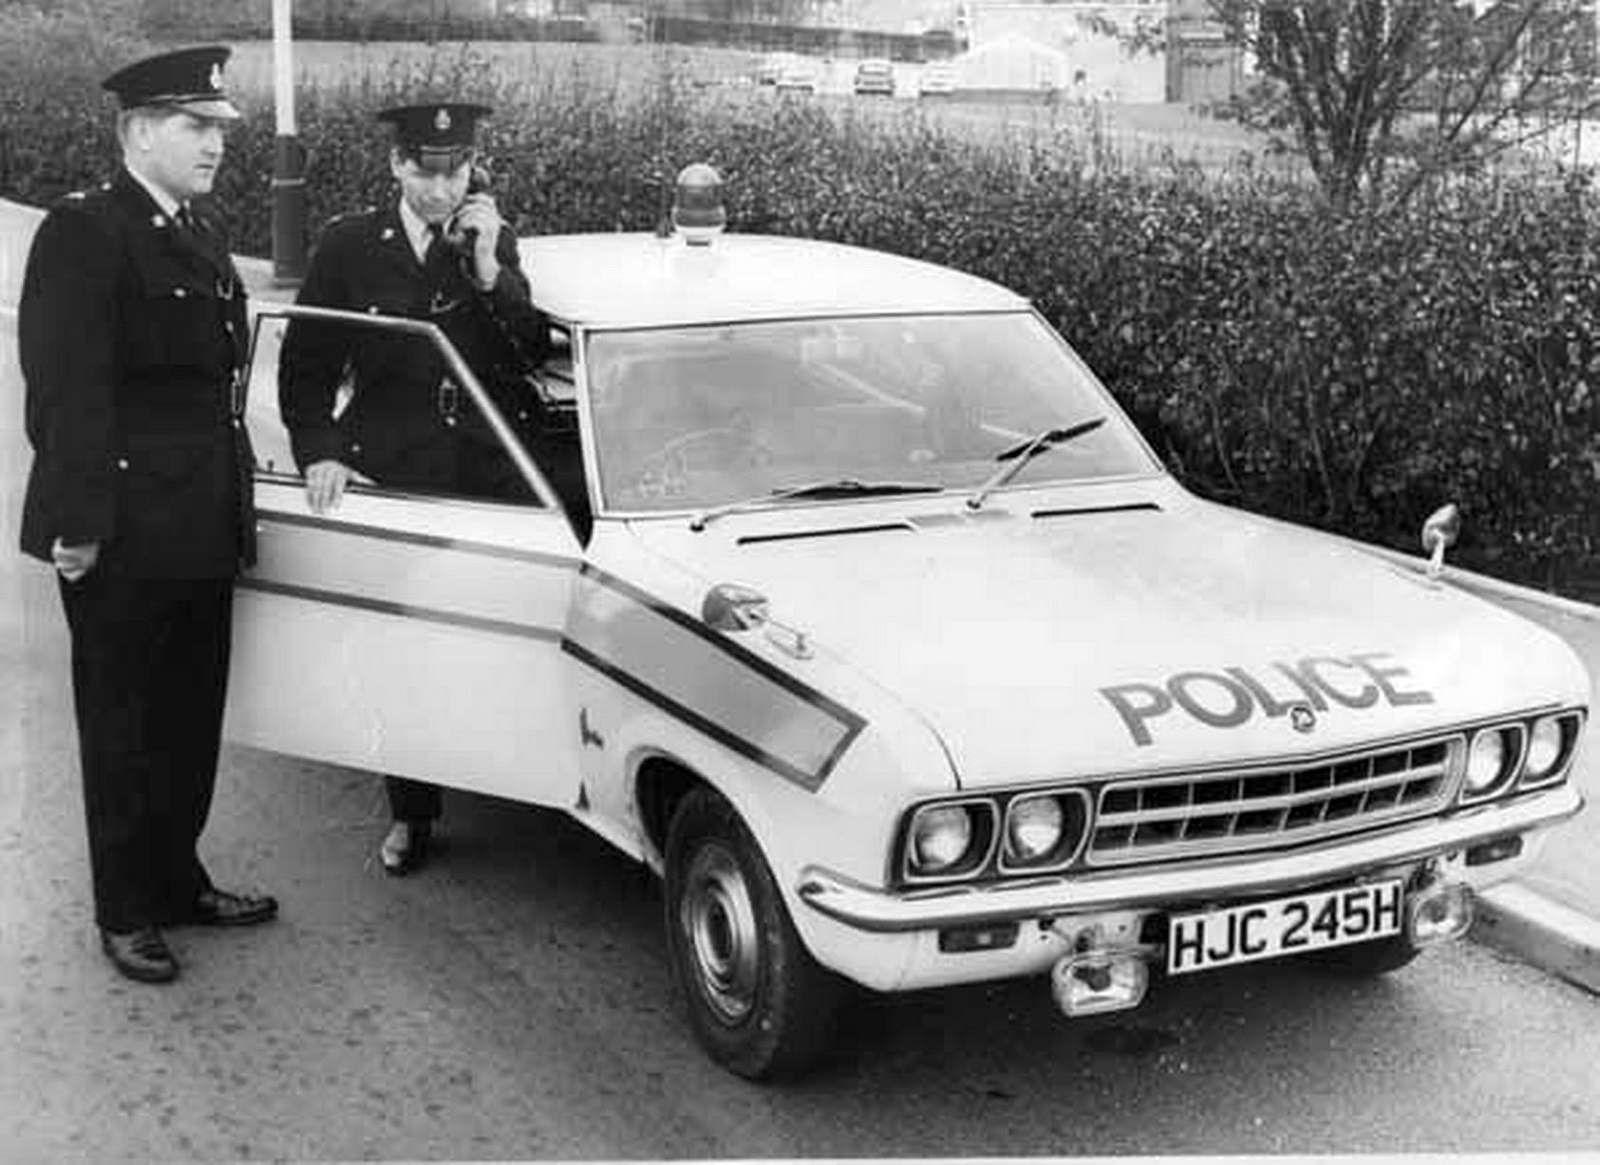 Classic British police cars, Vauxhall Victor 3300 SL